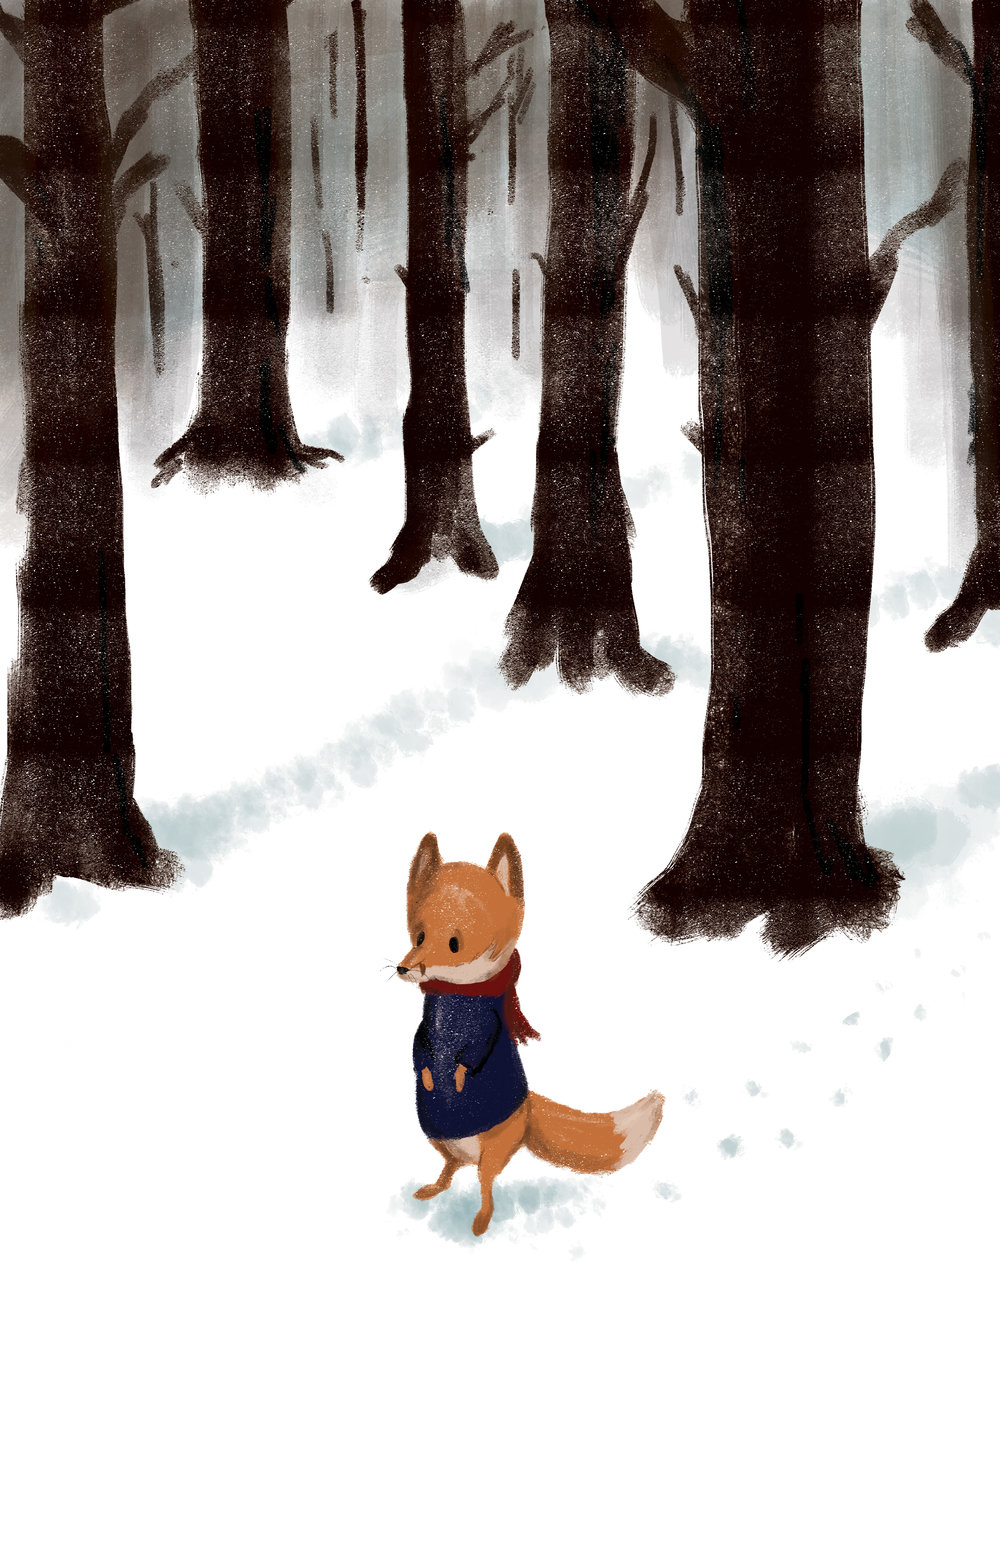 LittleFox_Illustration_RGB.jpg